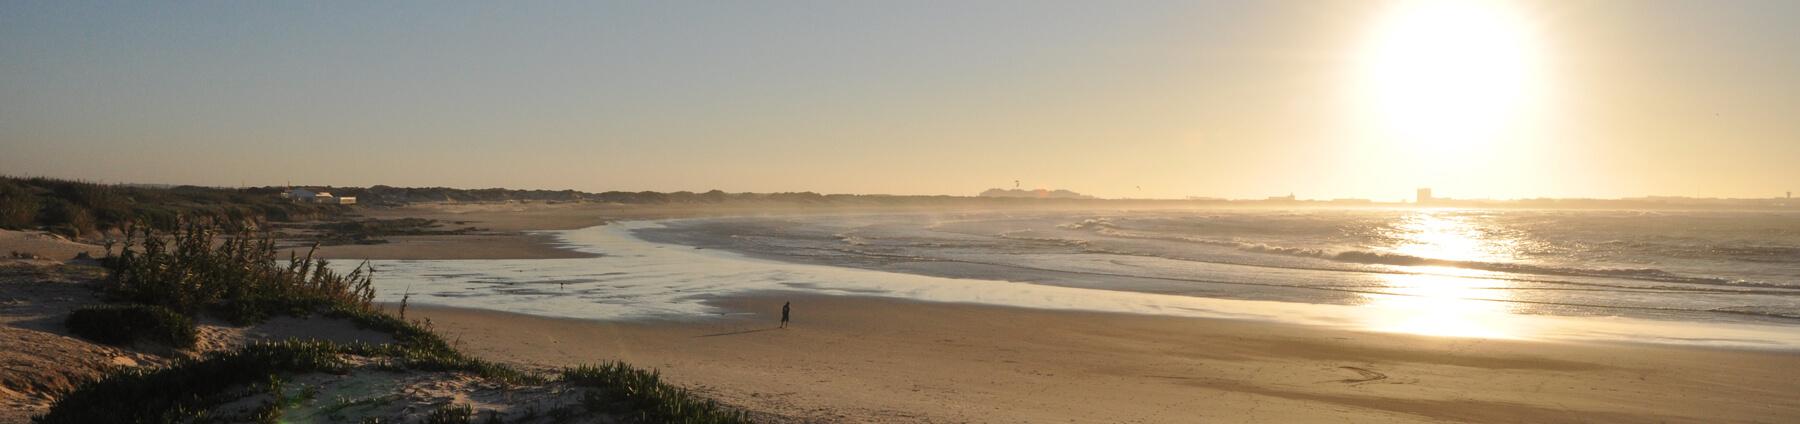 Baleal-och-Peniche-sunset-at-Silver-Coast